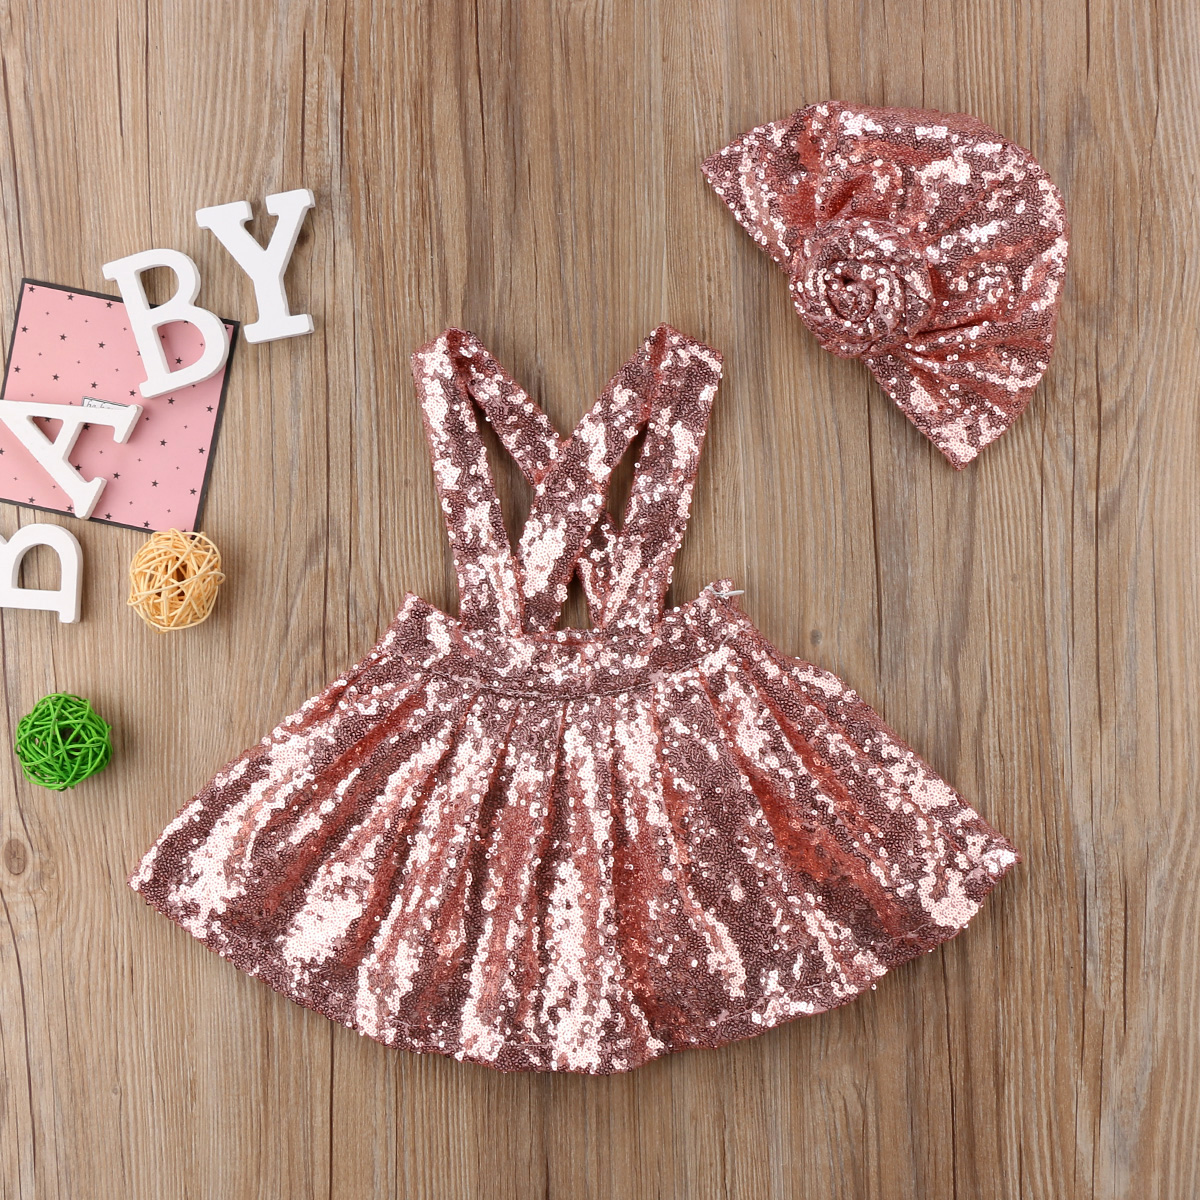 Trend Mark Sequin Kids Baby Meisjes Jarretelle Overalls Jarretel Jurk 2 Stks Hoed Outfits Kleding Yu